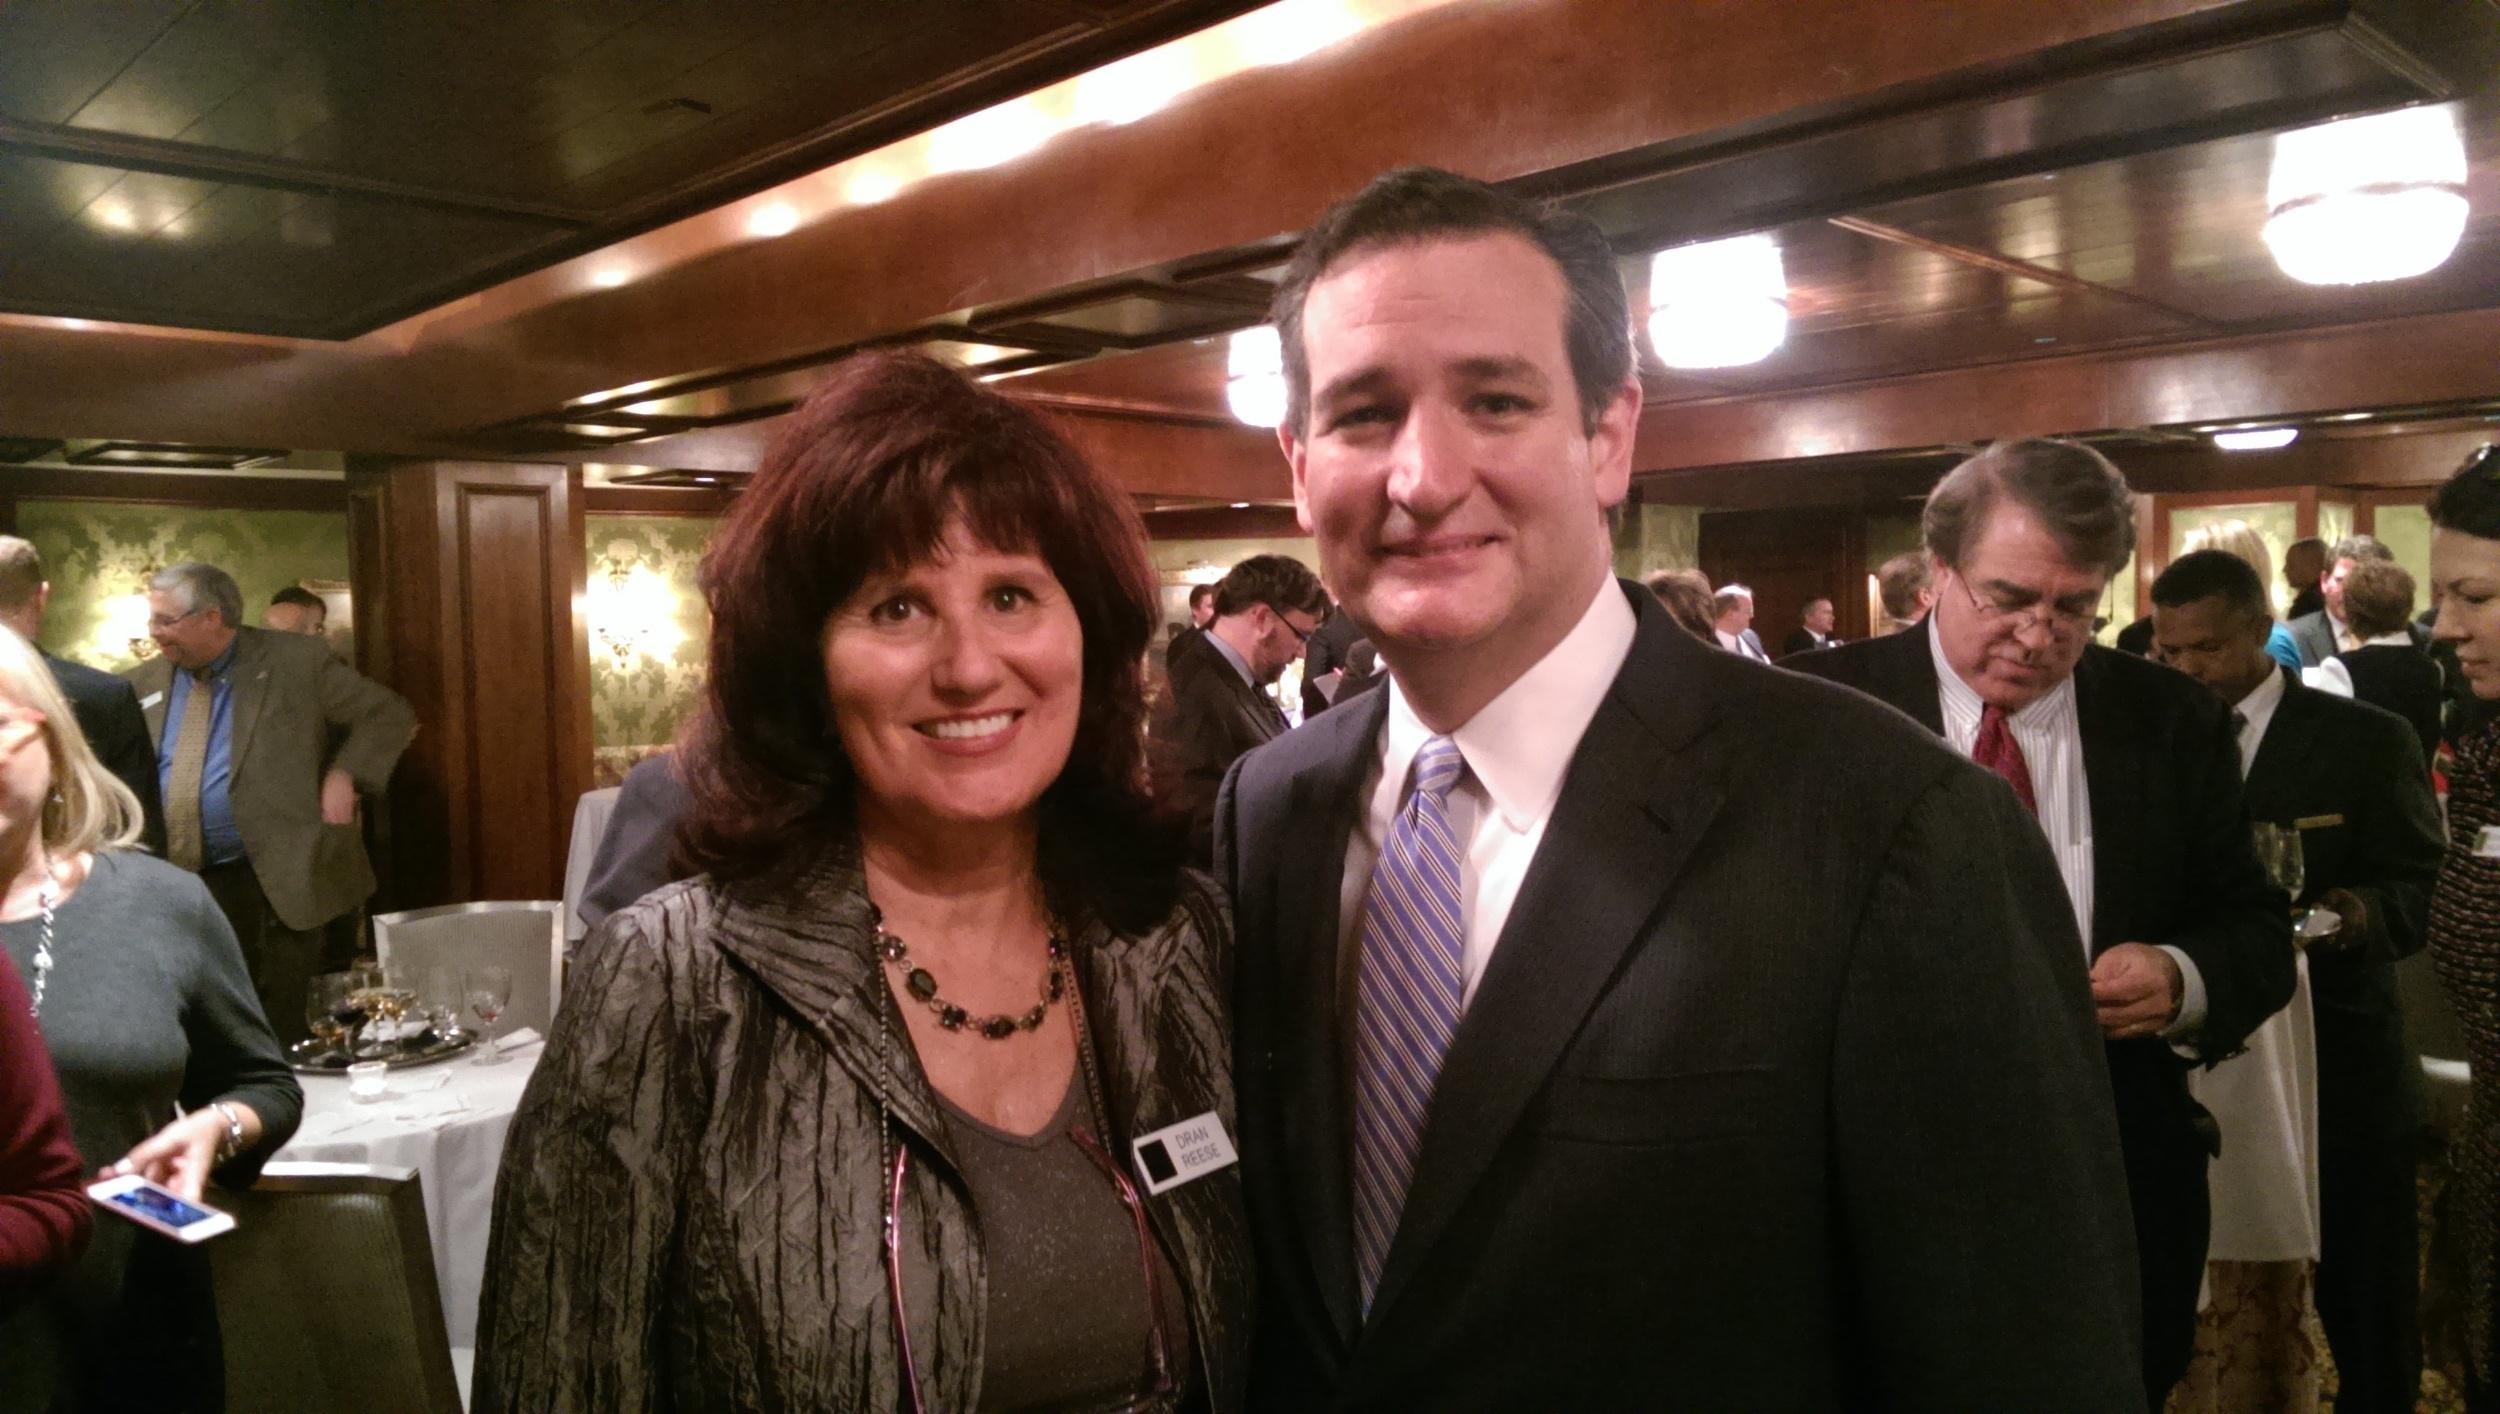 Ted Cruz+Dran.jpg